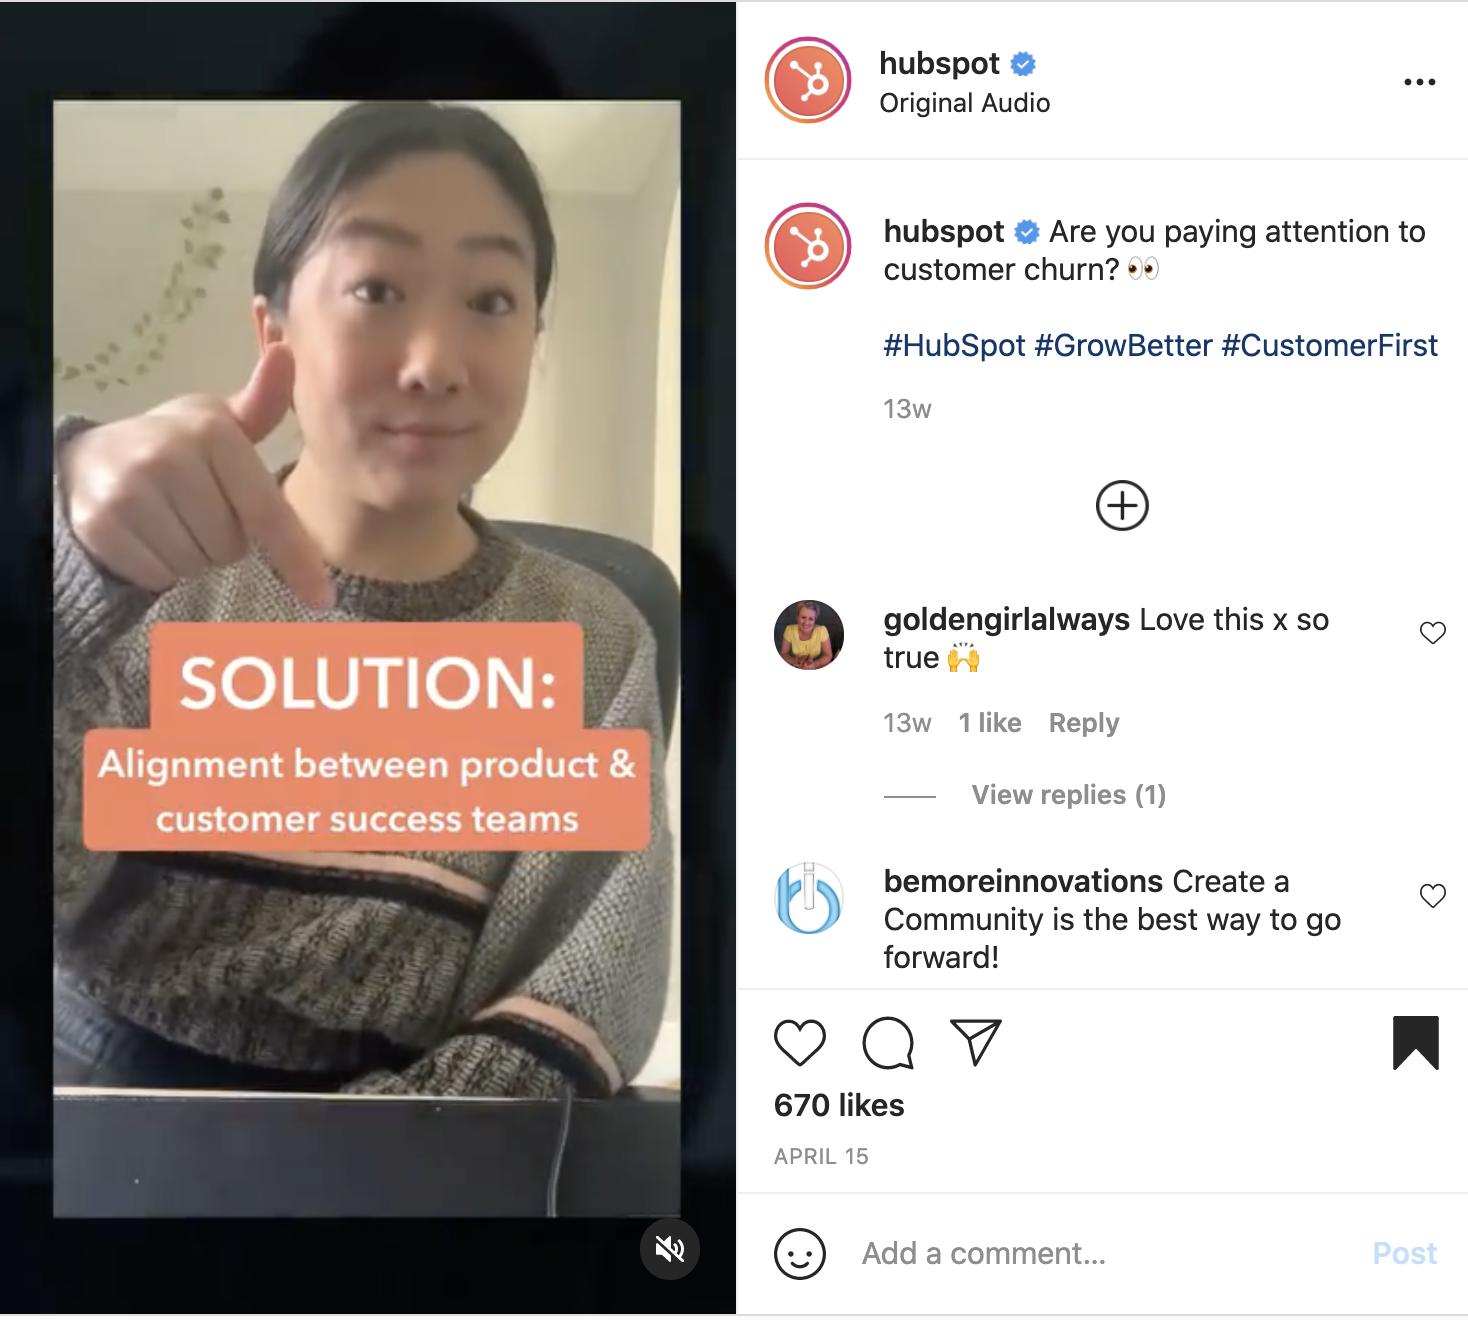 b2b instagram reels example - hubspot